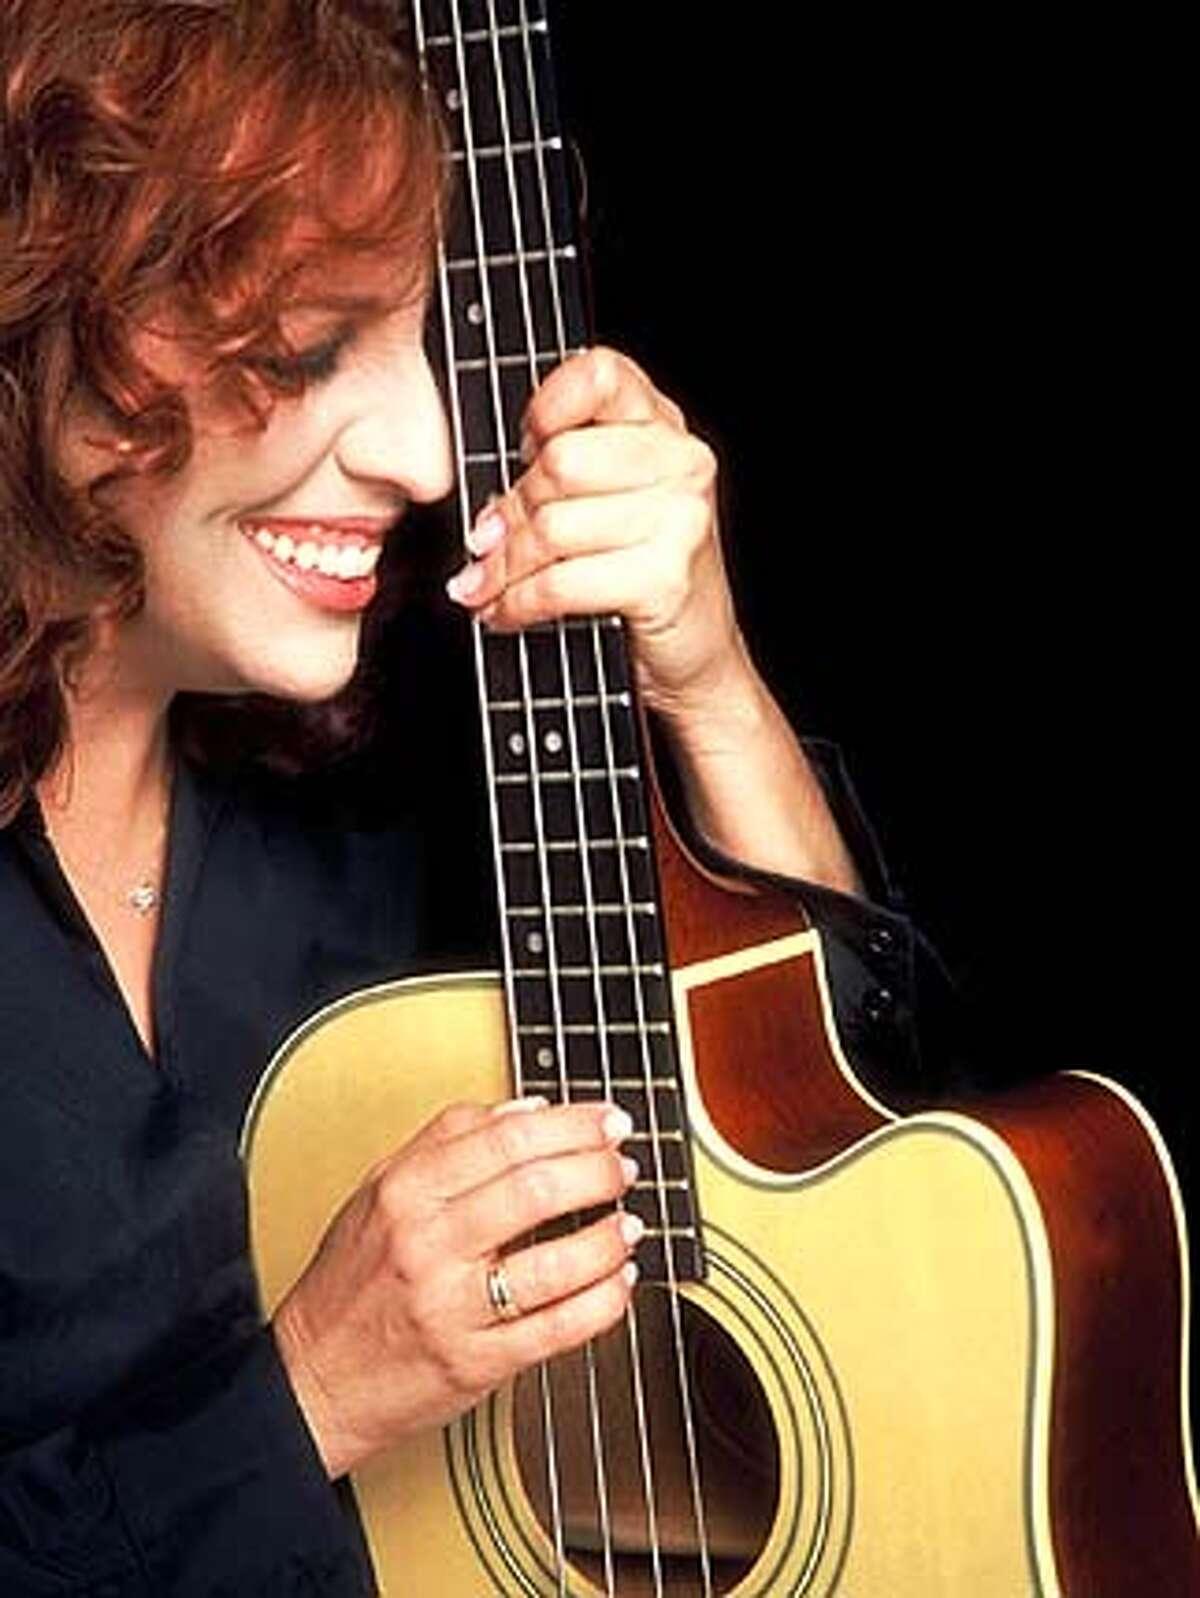 The 2002 Green Music Festival at Sonoma State University presents Cuban Jazz & Salsa on the Green ALBITA (HANDOUT PHOTO)